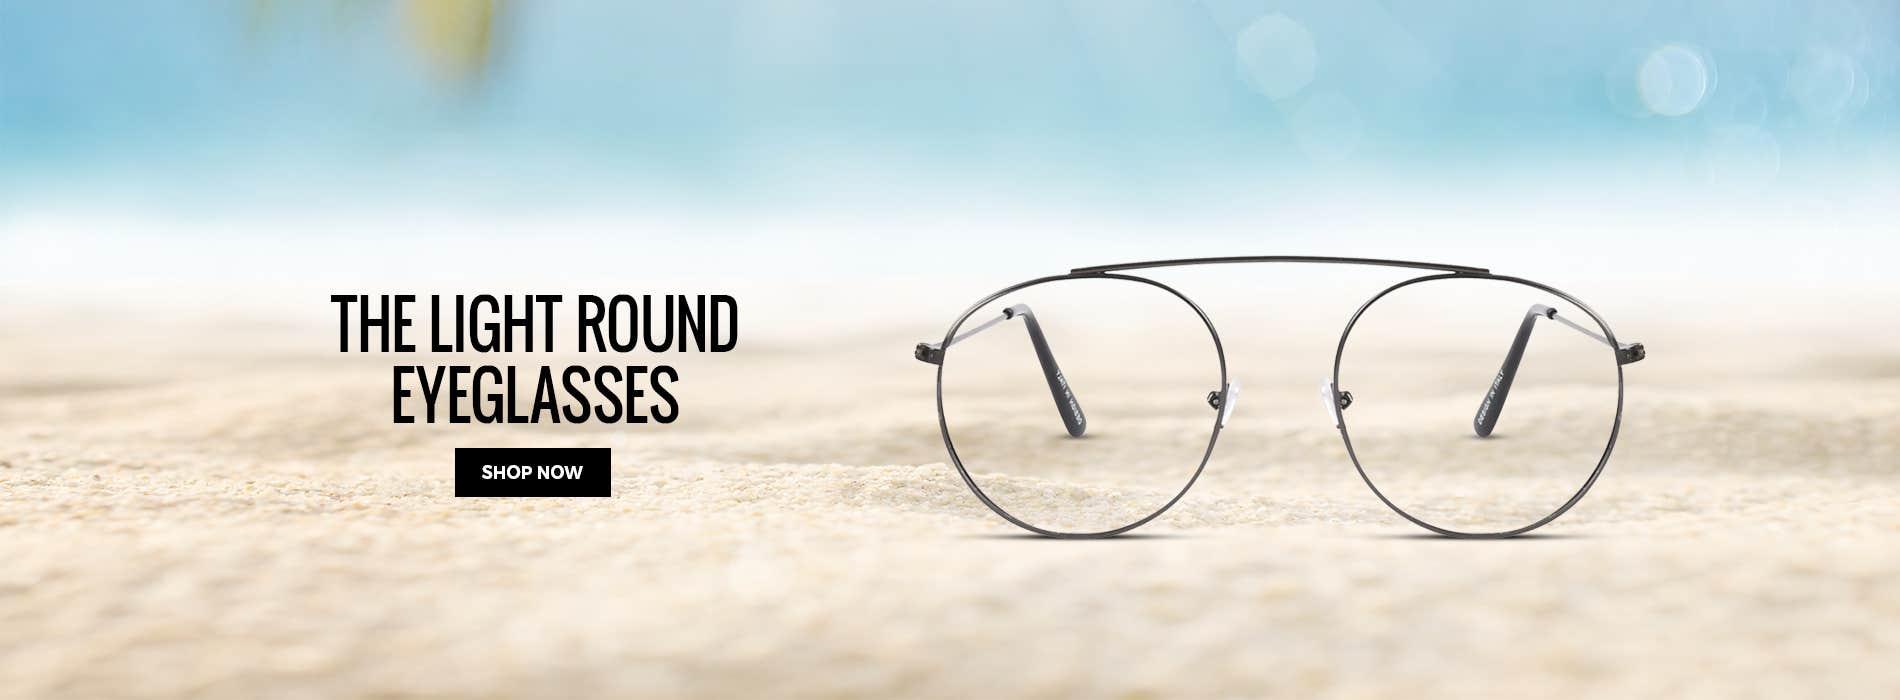 The Light Round Eyeglasses